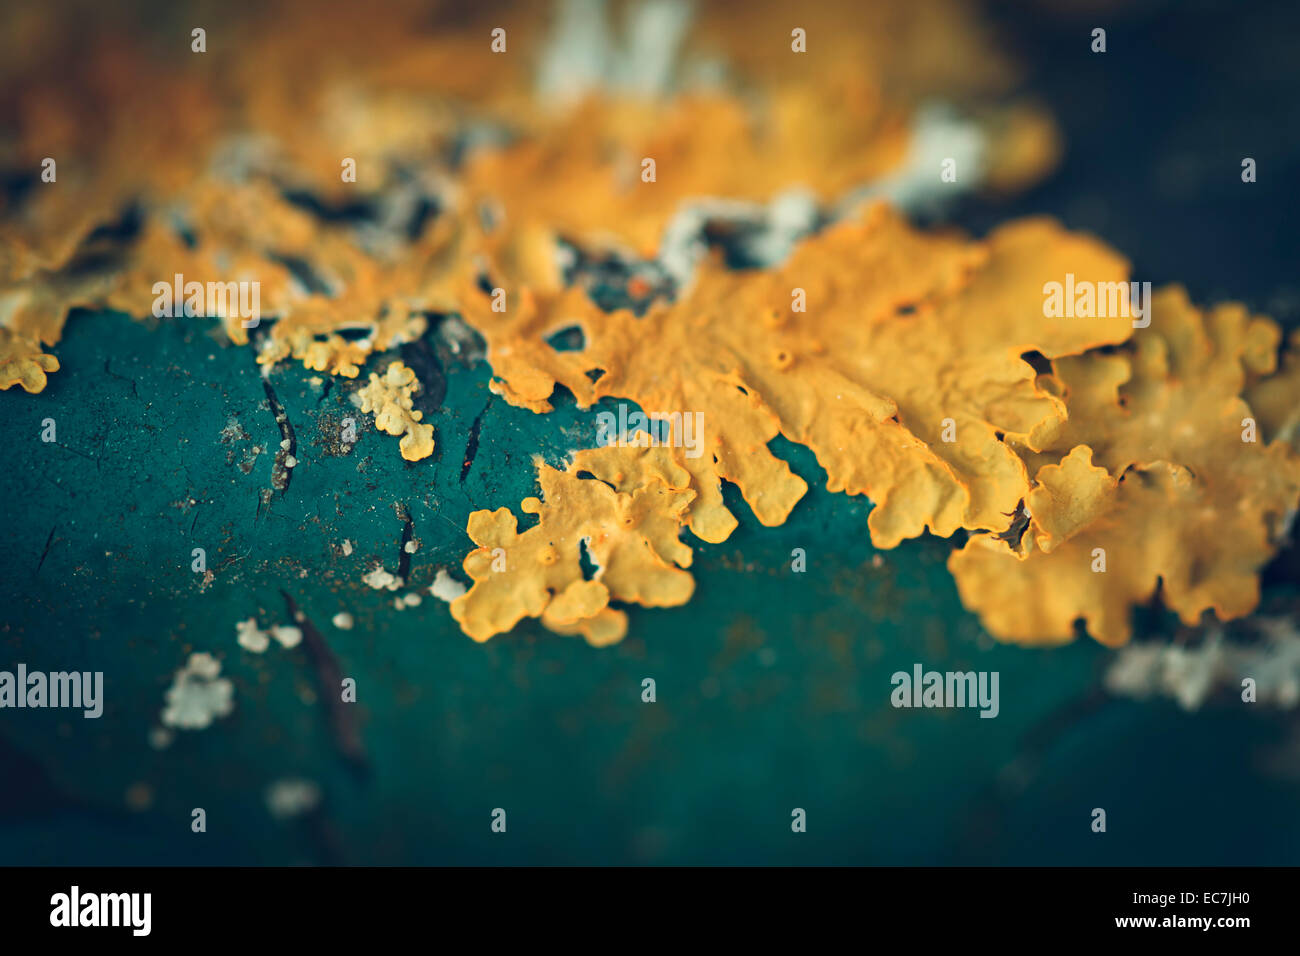 lichen close-up macro shot - Stock Image